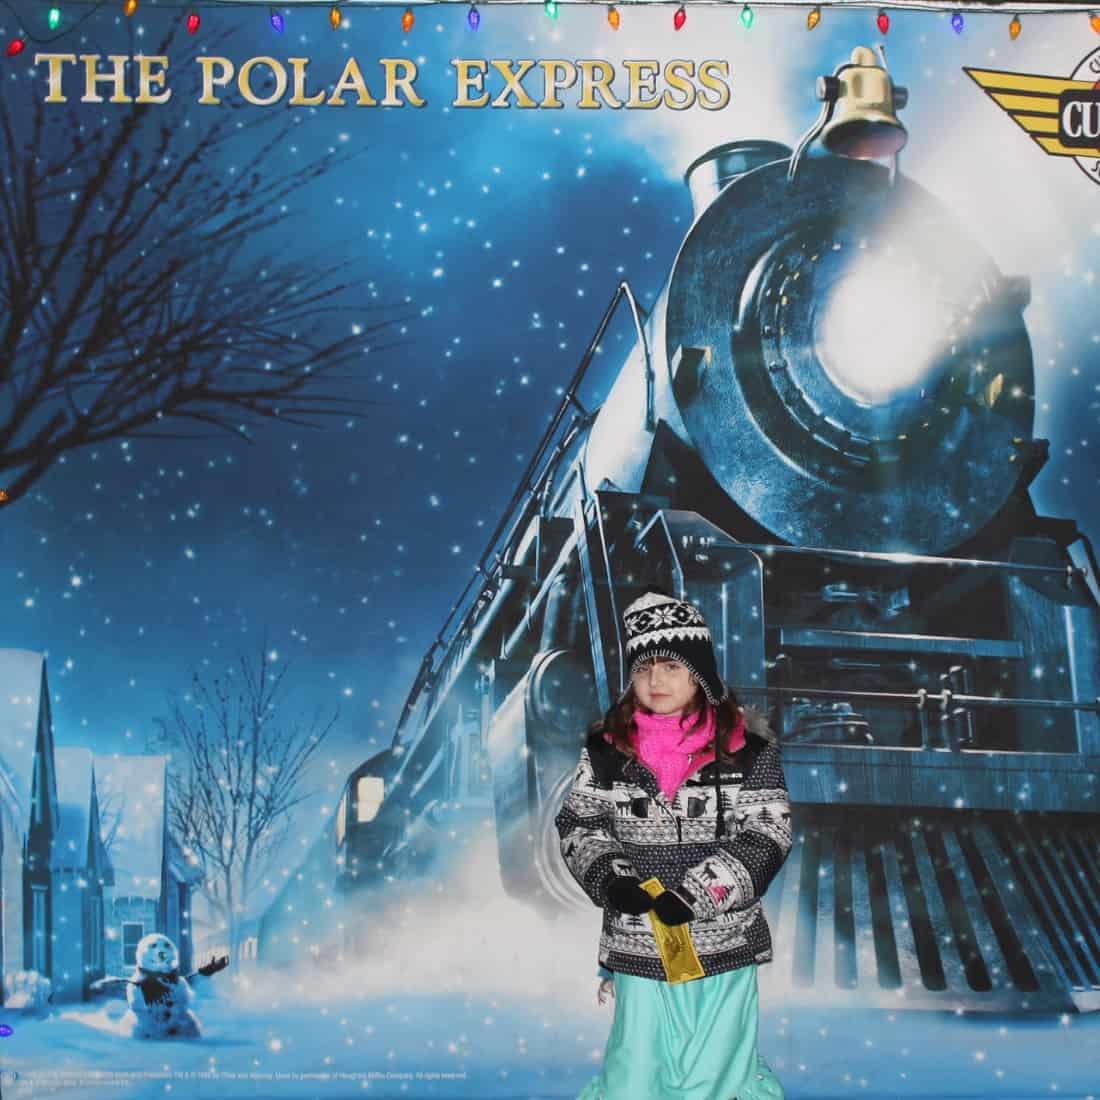 Polar Express Cleveland - Welcome sign